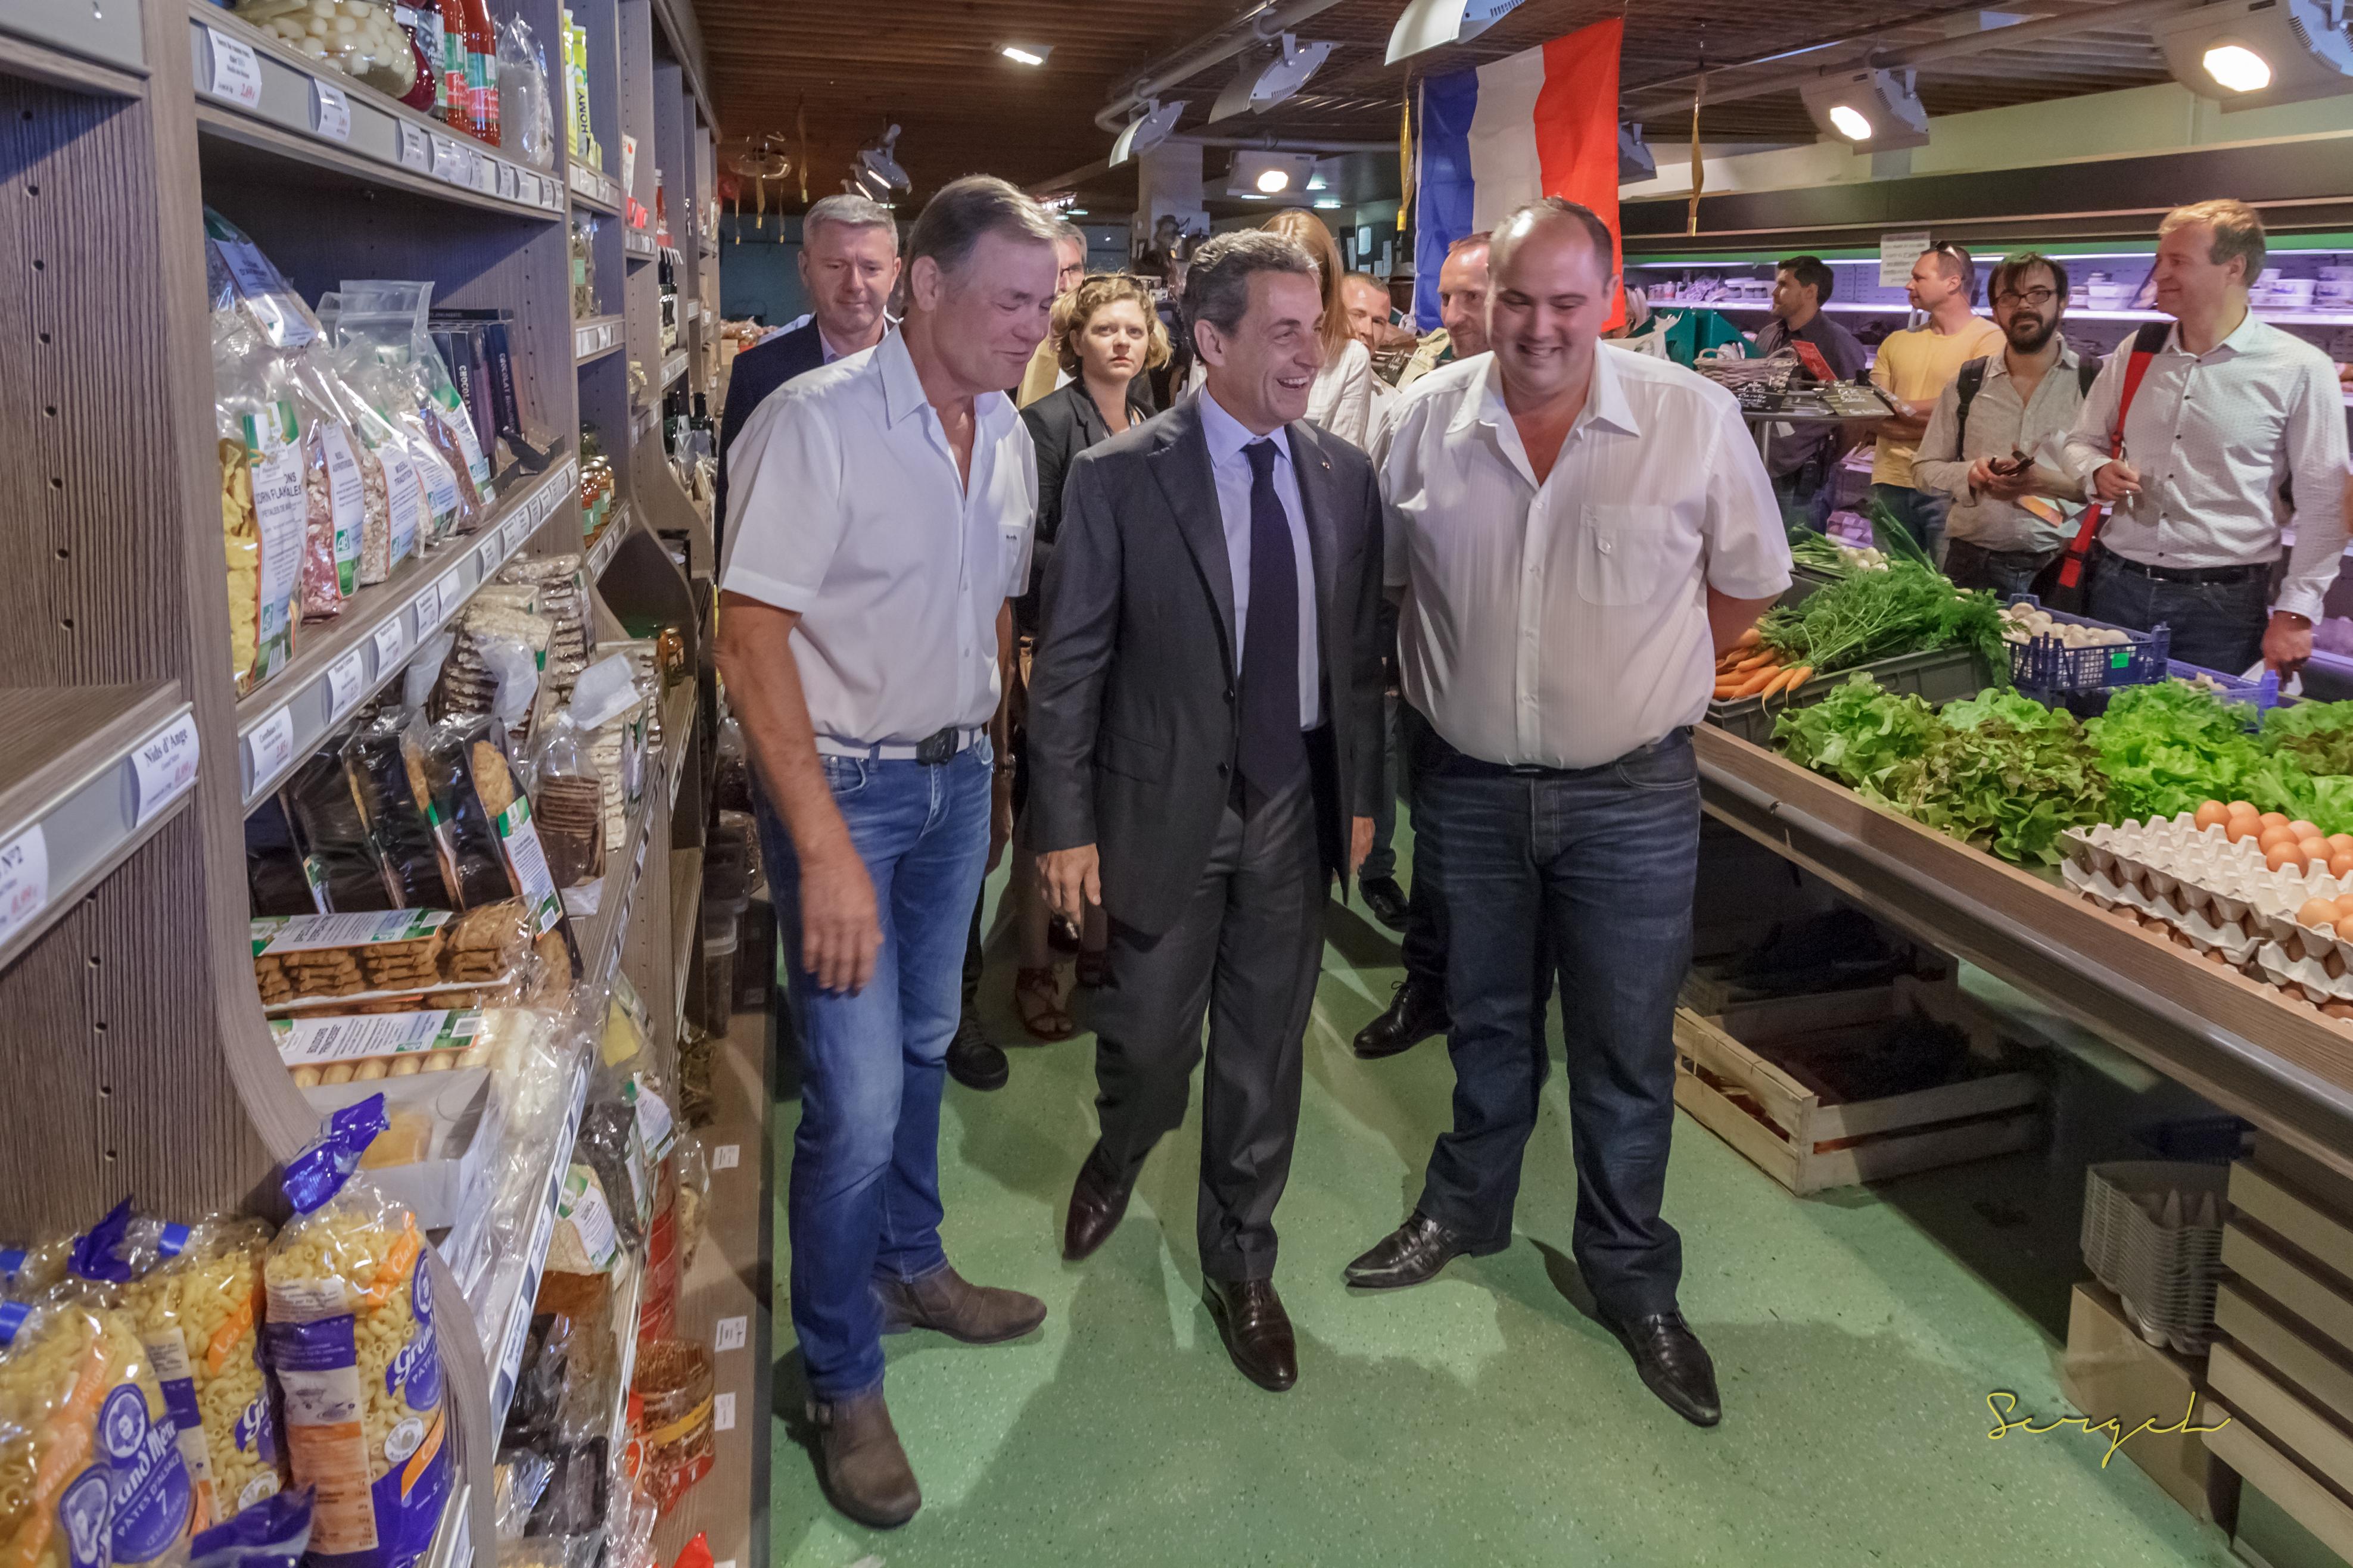 2016-07-09_11-48-34.59_Kriegsheim_Ferme_Baehl_Sarkozy